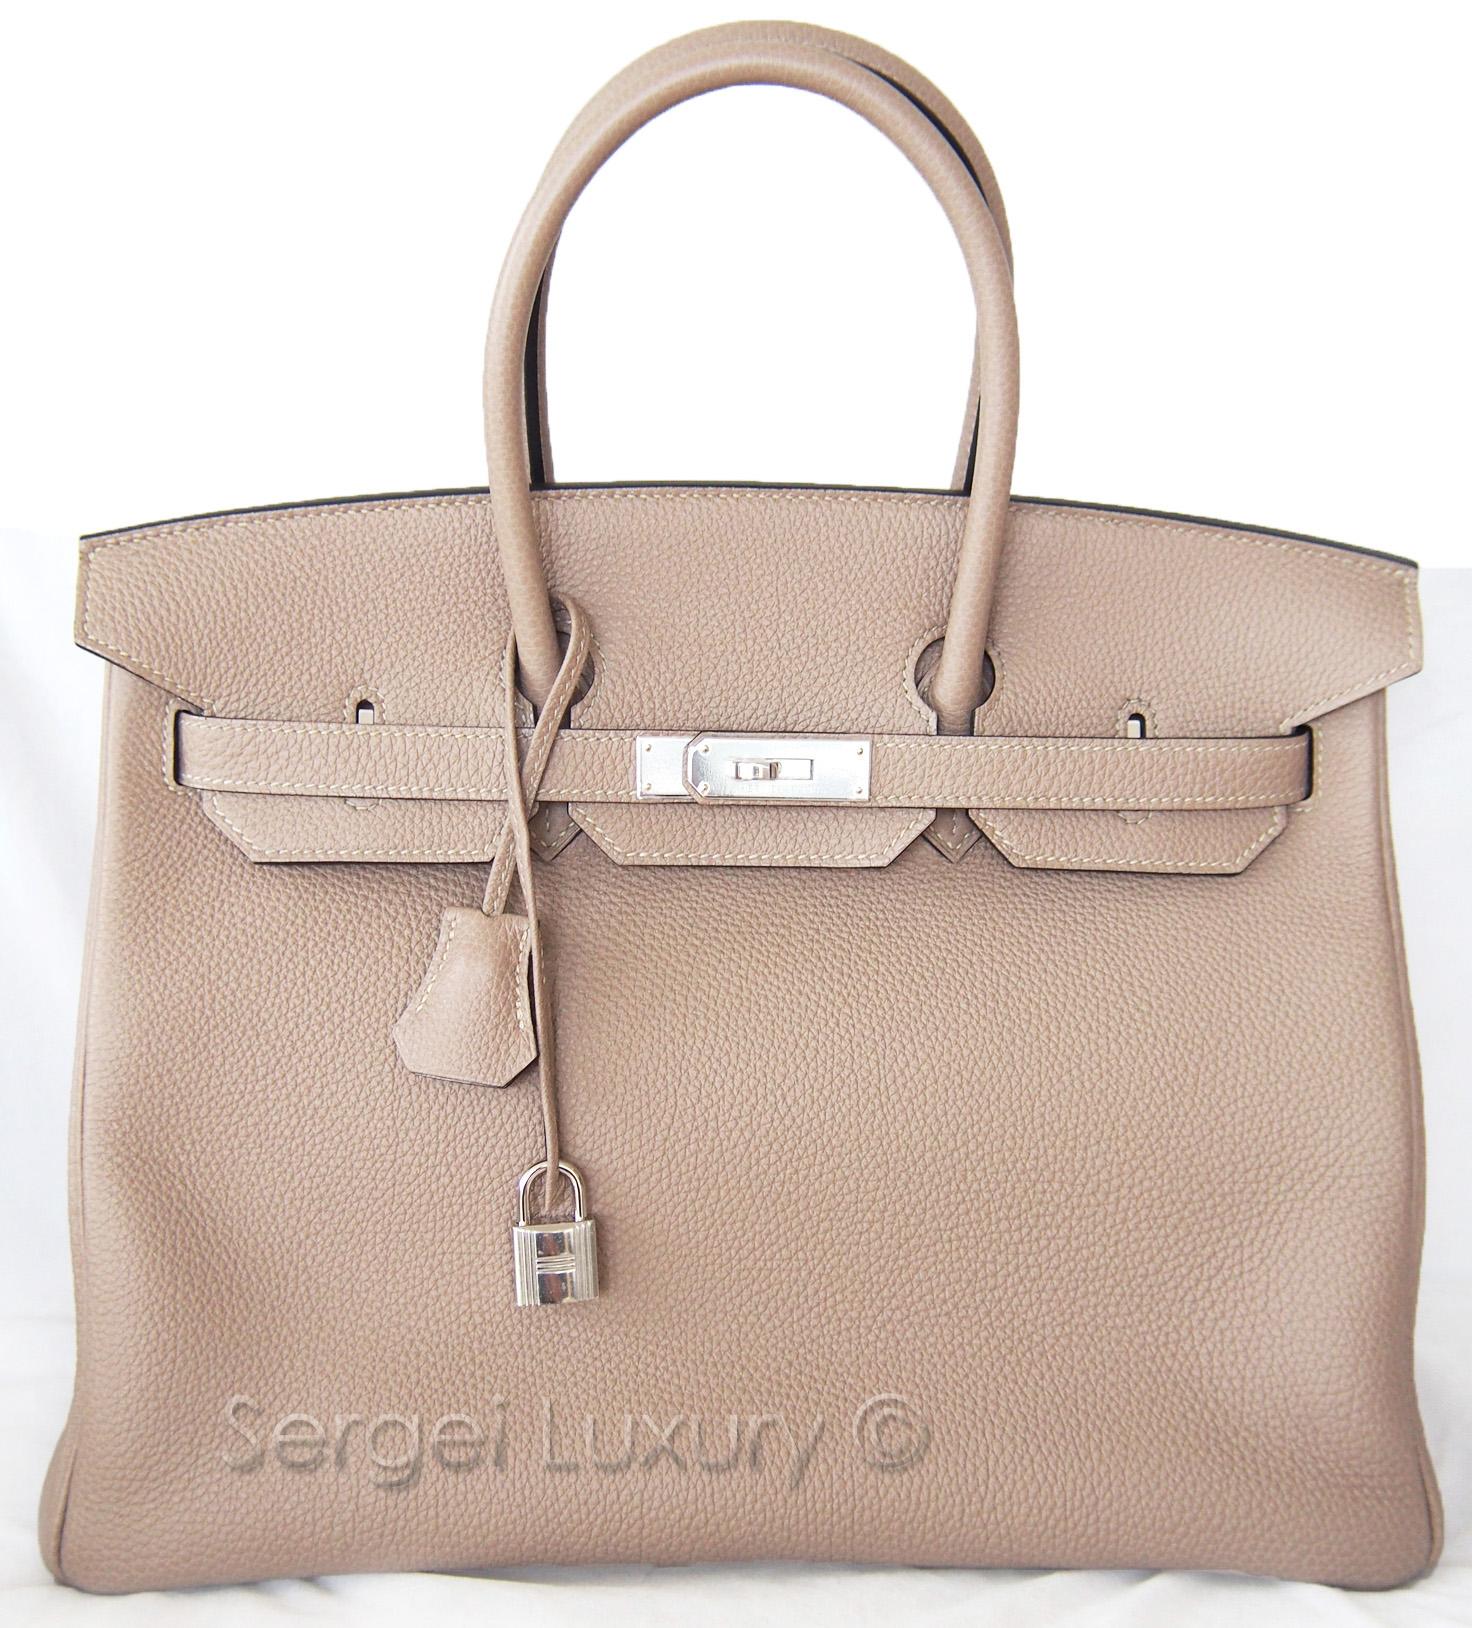 ea2efb8253 Elegant!! NEW Hermes Birkin 35 Gris Tourterelle Dove Grey Togo Tote ...